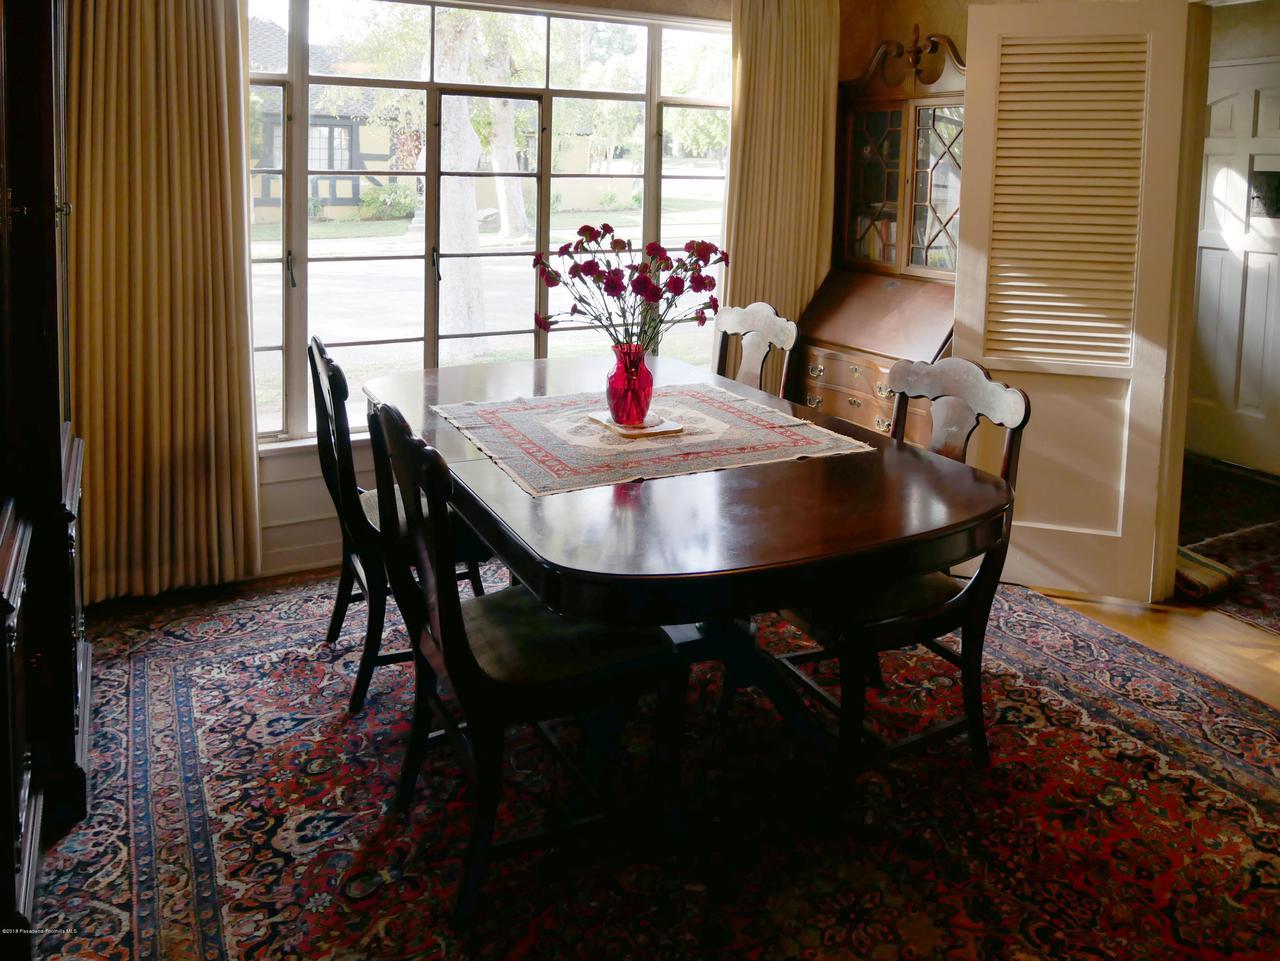 2432 ORANGE GROVE, Pasadena, CA 91104 - Dining Room 2